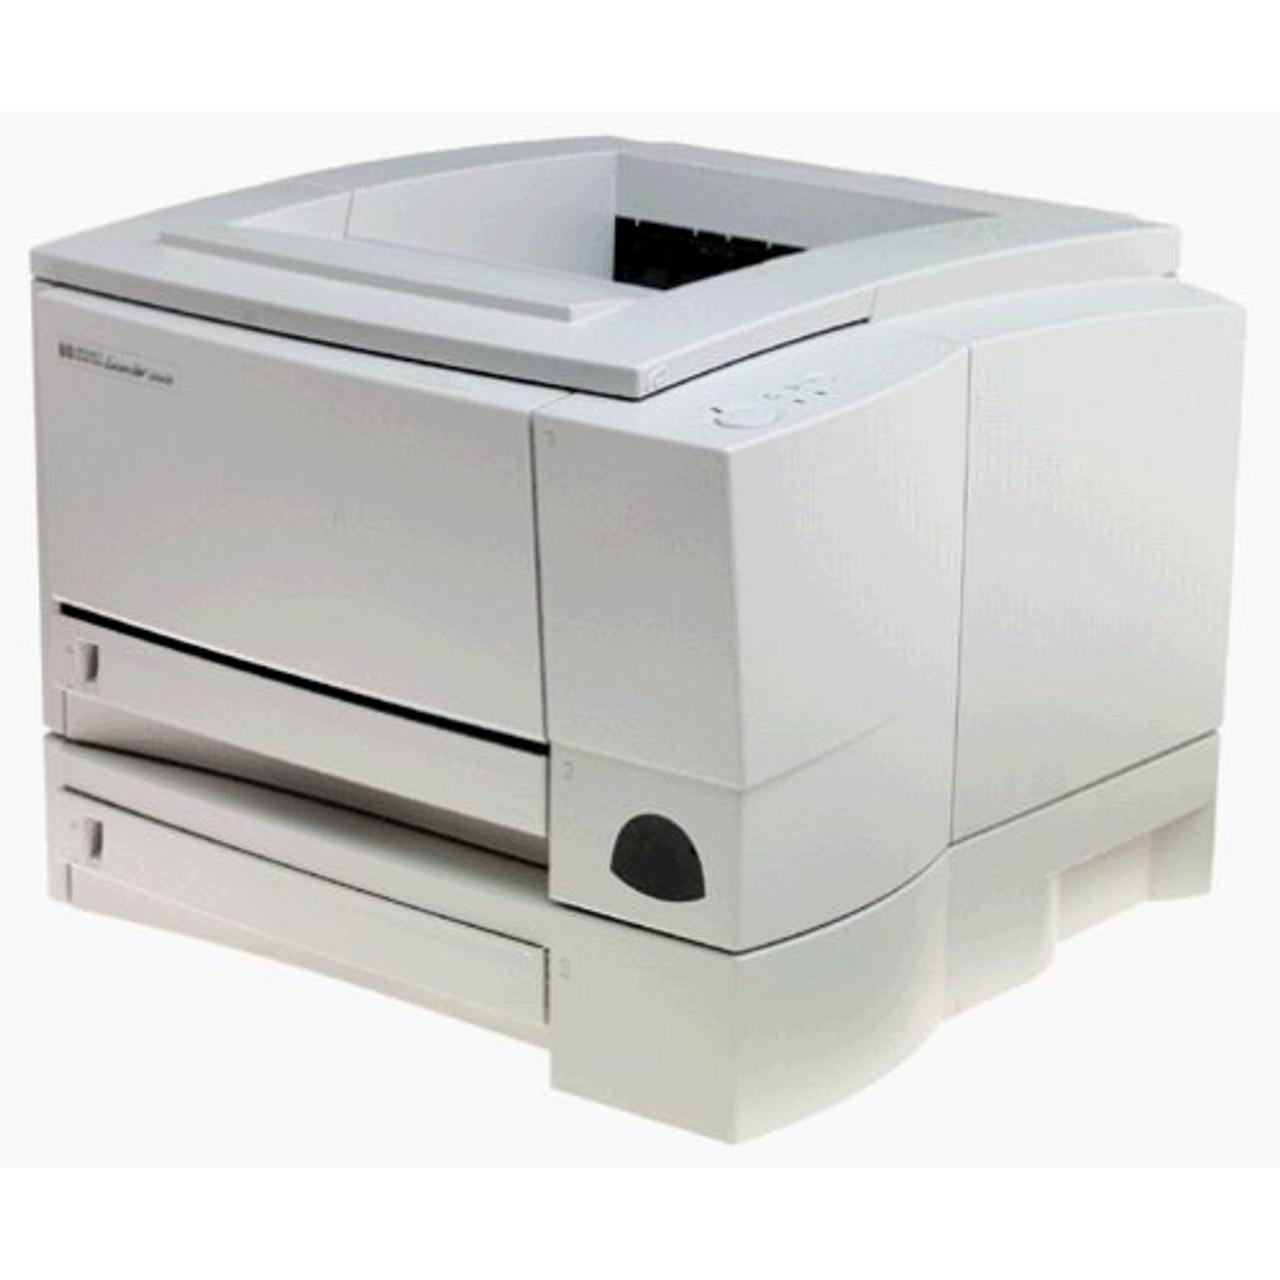 HP LaserJet 2200TN - C7064A - HP Laser Printer for sale